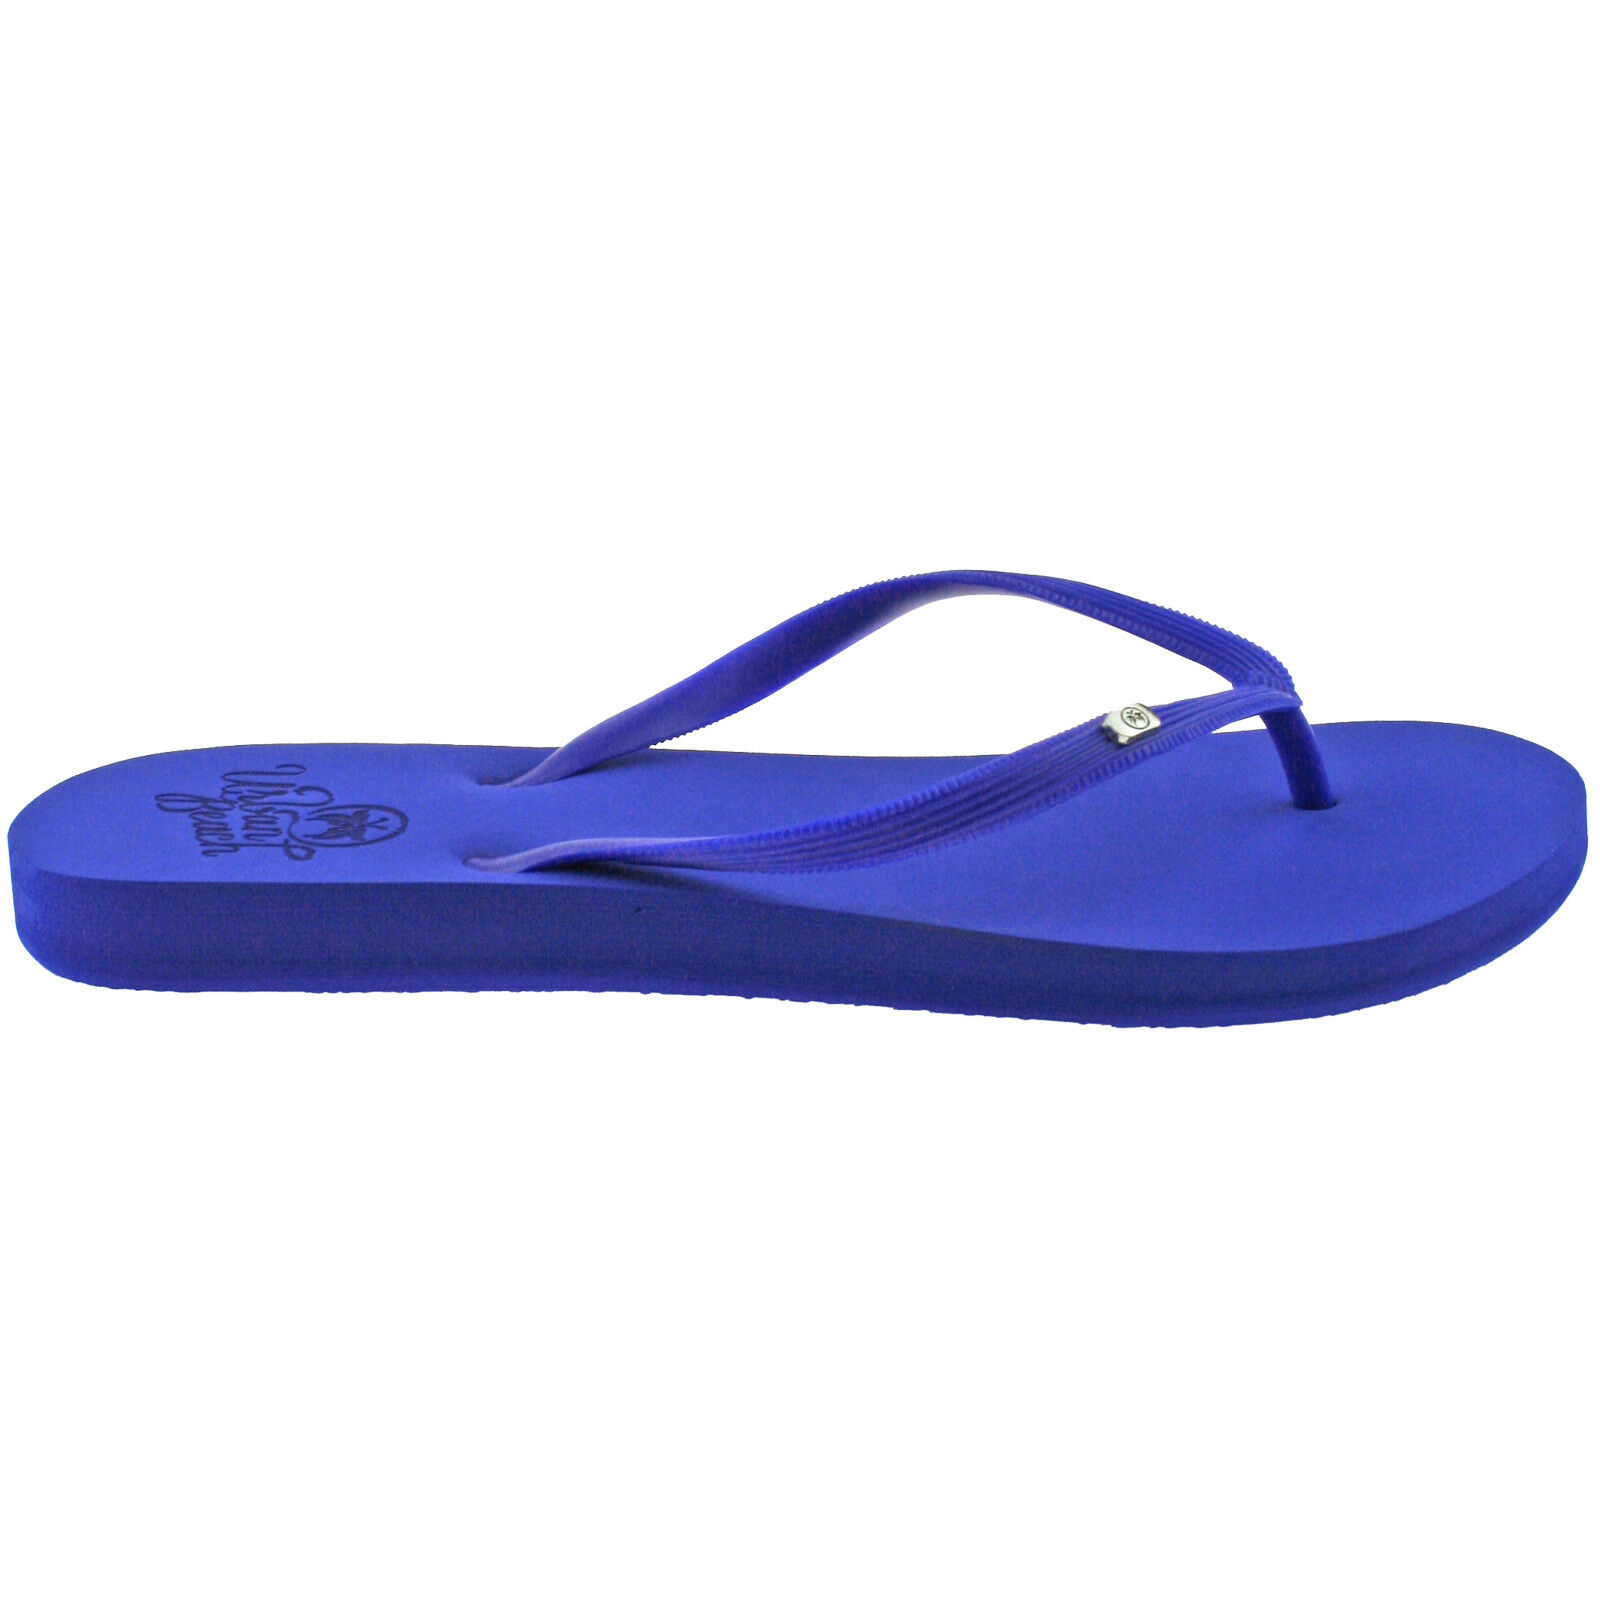 Ladies Urban Beach Wight Blue Toe Post Flip Flops Sandals -7744